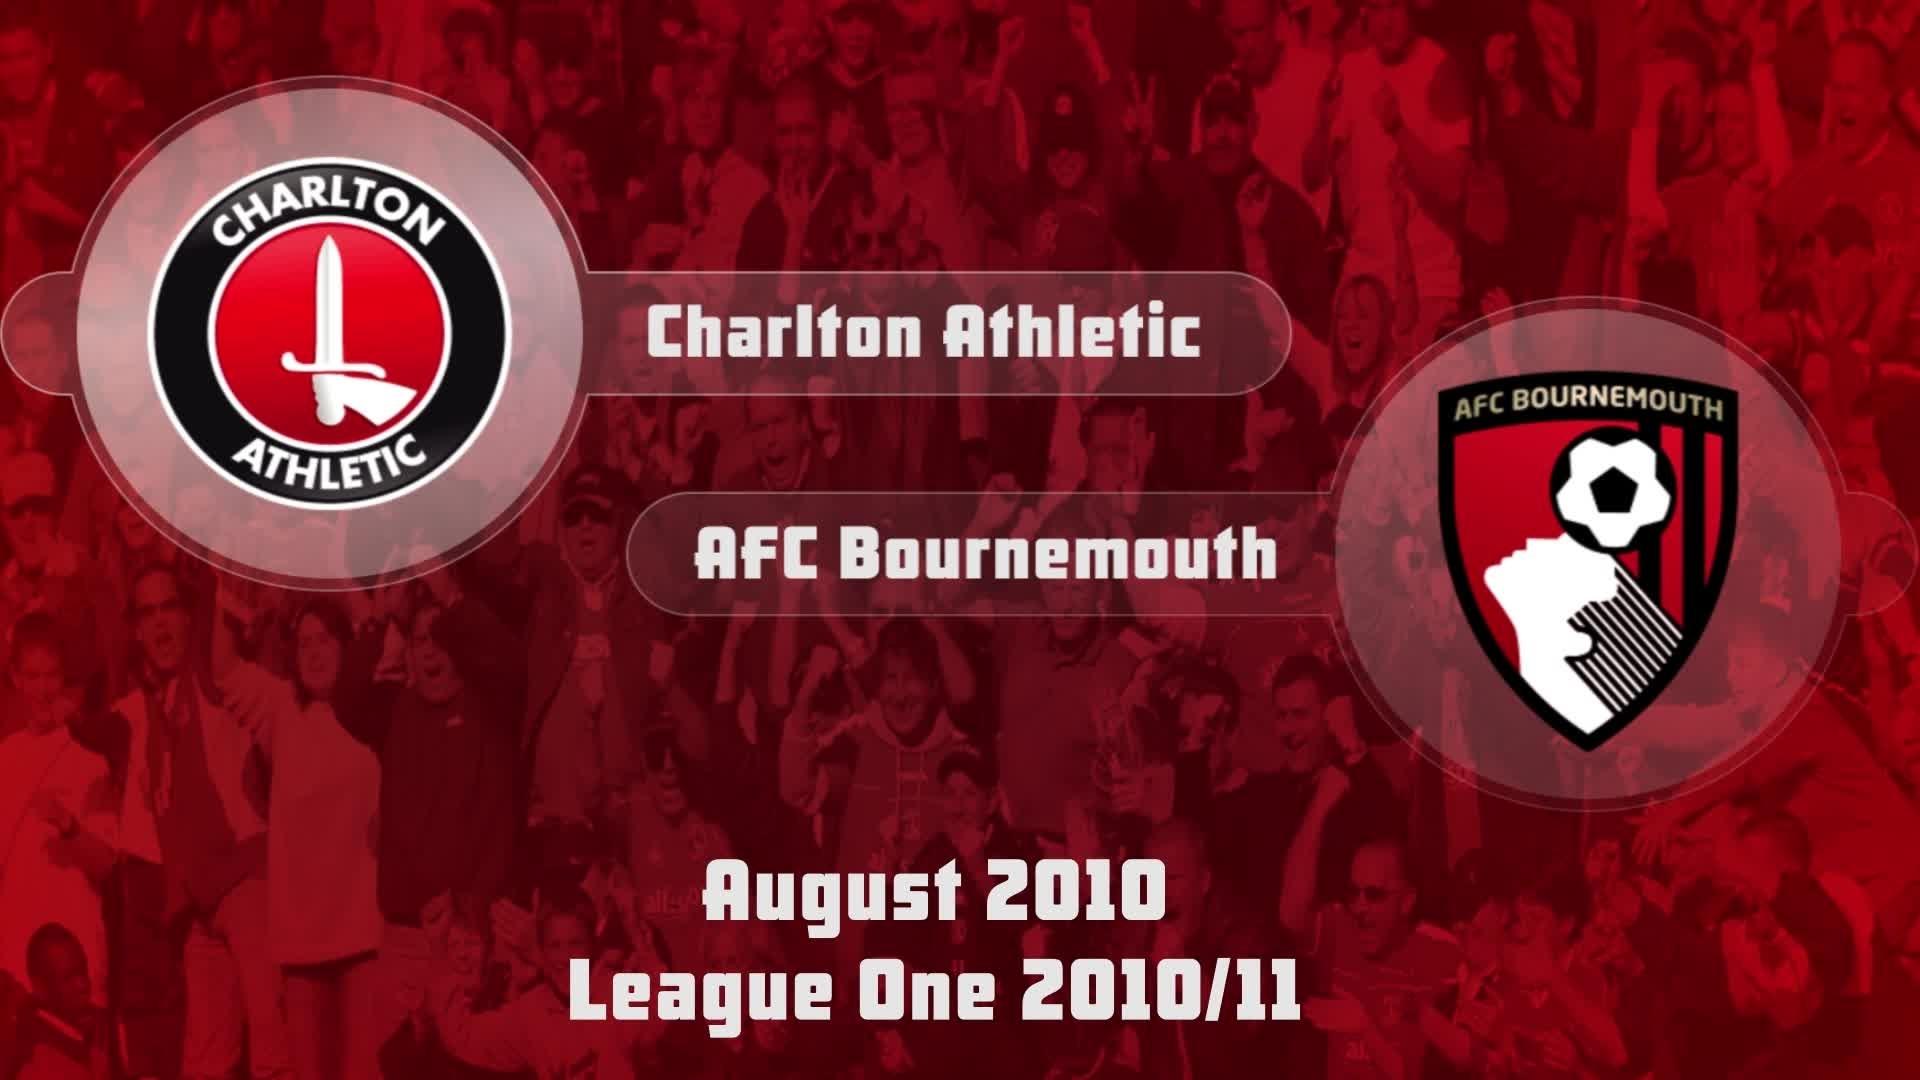 01 HIGHLIGHTS | Charlton 1 AFC Bournemouth 0 (Aug 2010)